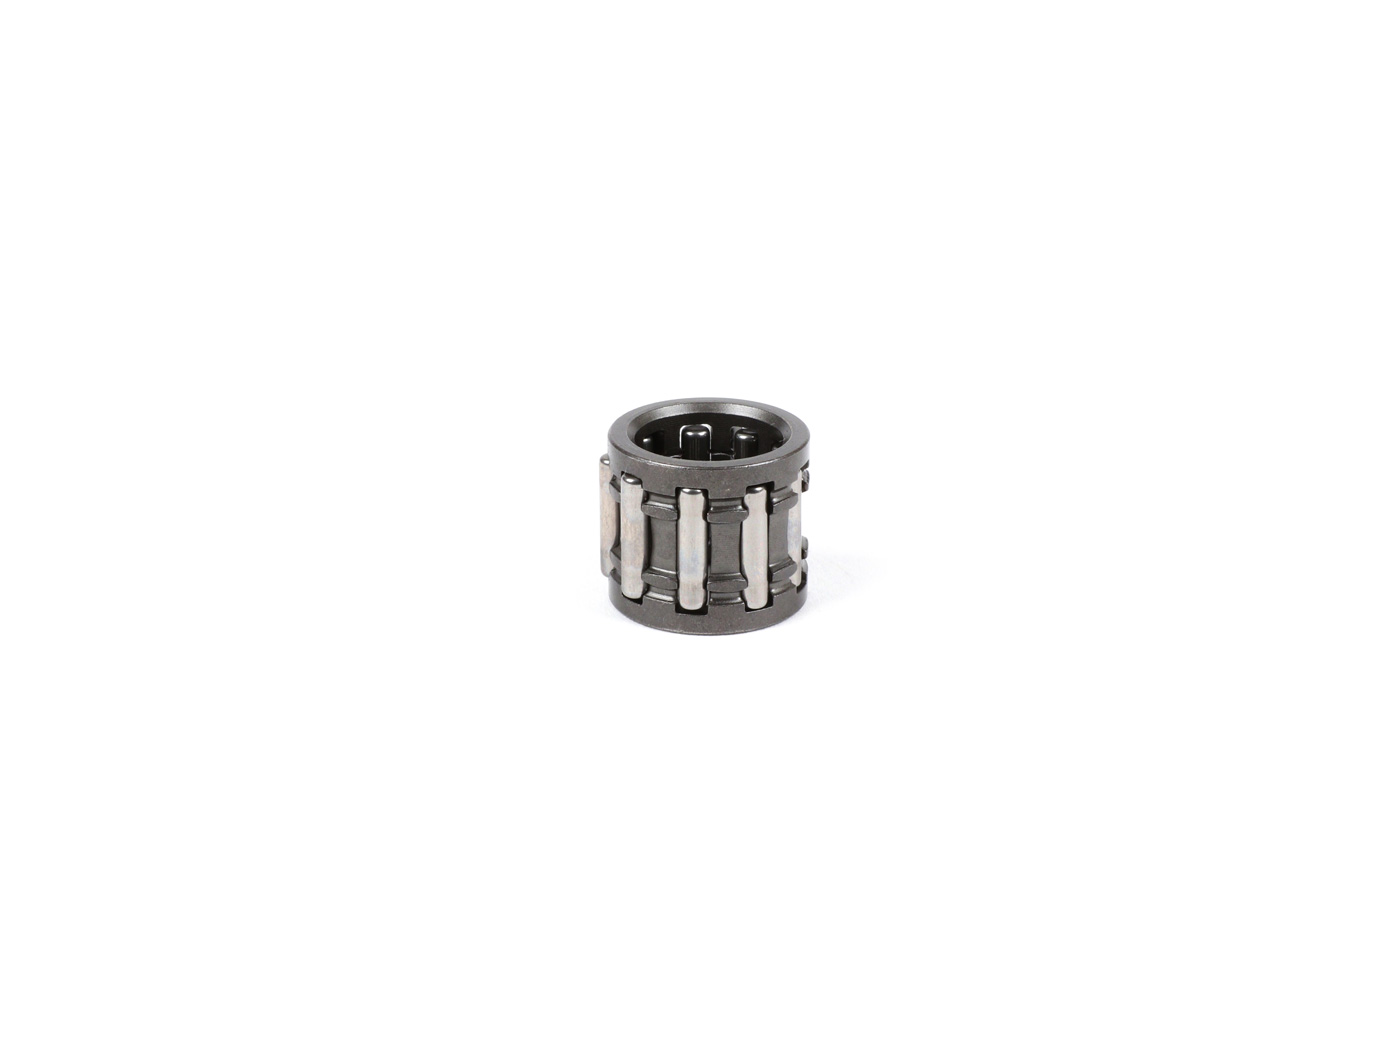 Nadellager Kolbenbolzenlager 12x17x13mm Piaggio//Vespa NRG mc2 DD 50 LC Extre